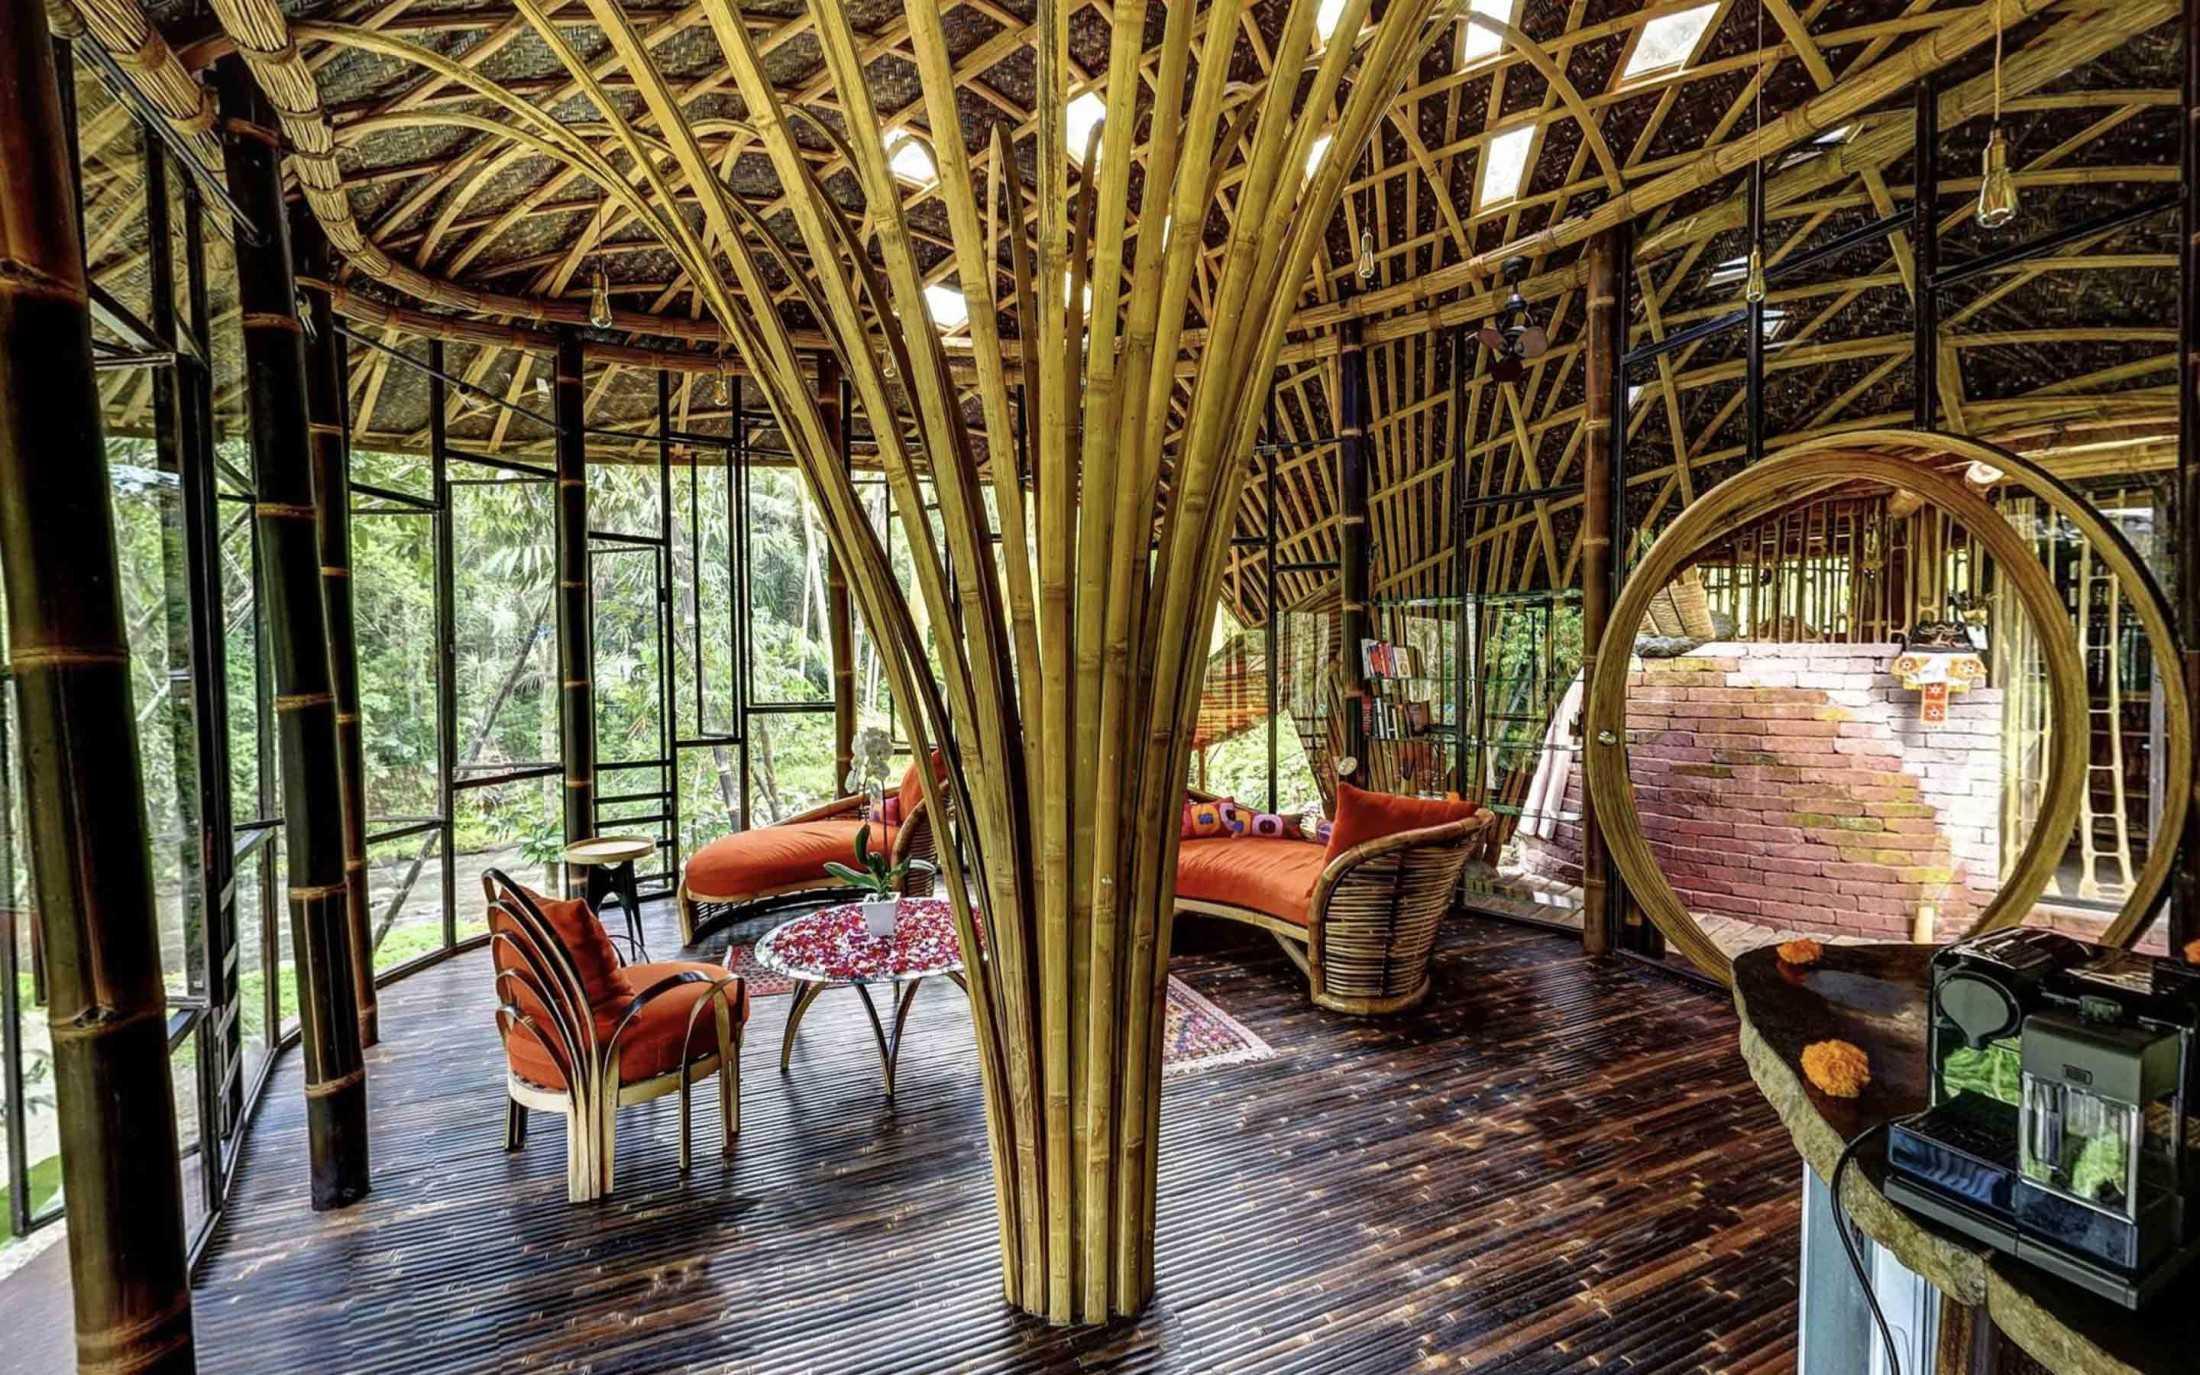 Agung Budi Raharsa | Architecture & Engineering Riverbend Bamboo House - Bali Bali, Indonesia Bali, Indonesia Agung-Budi-Raharsa-Riverbend-House-Bali  88716